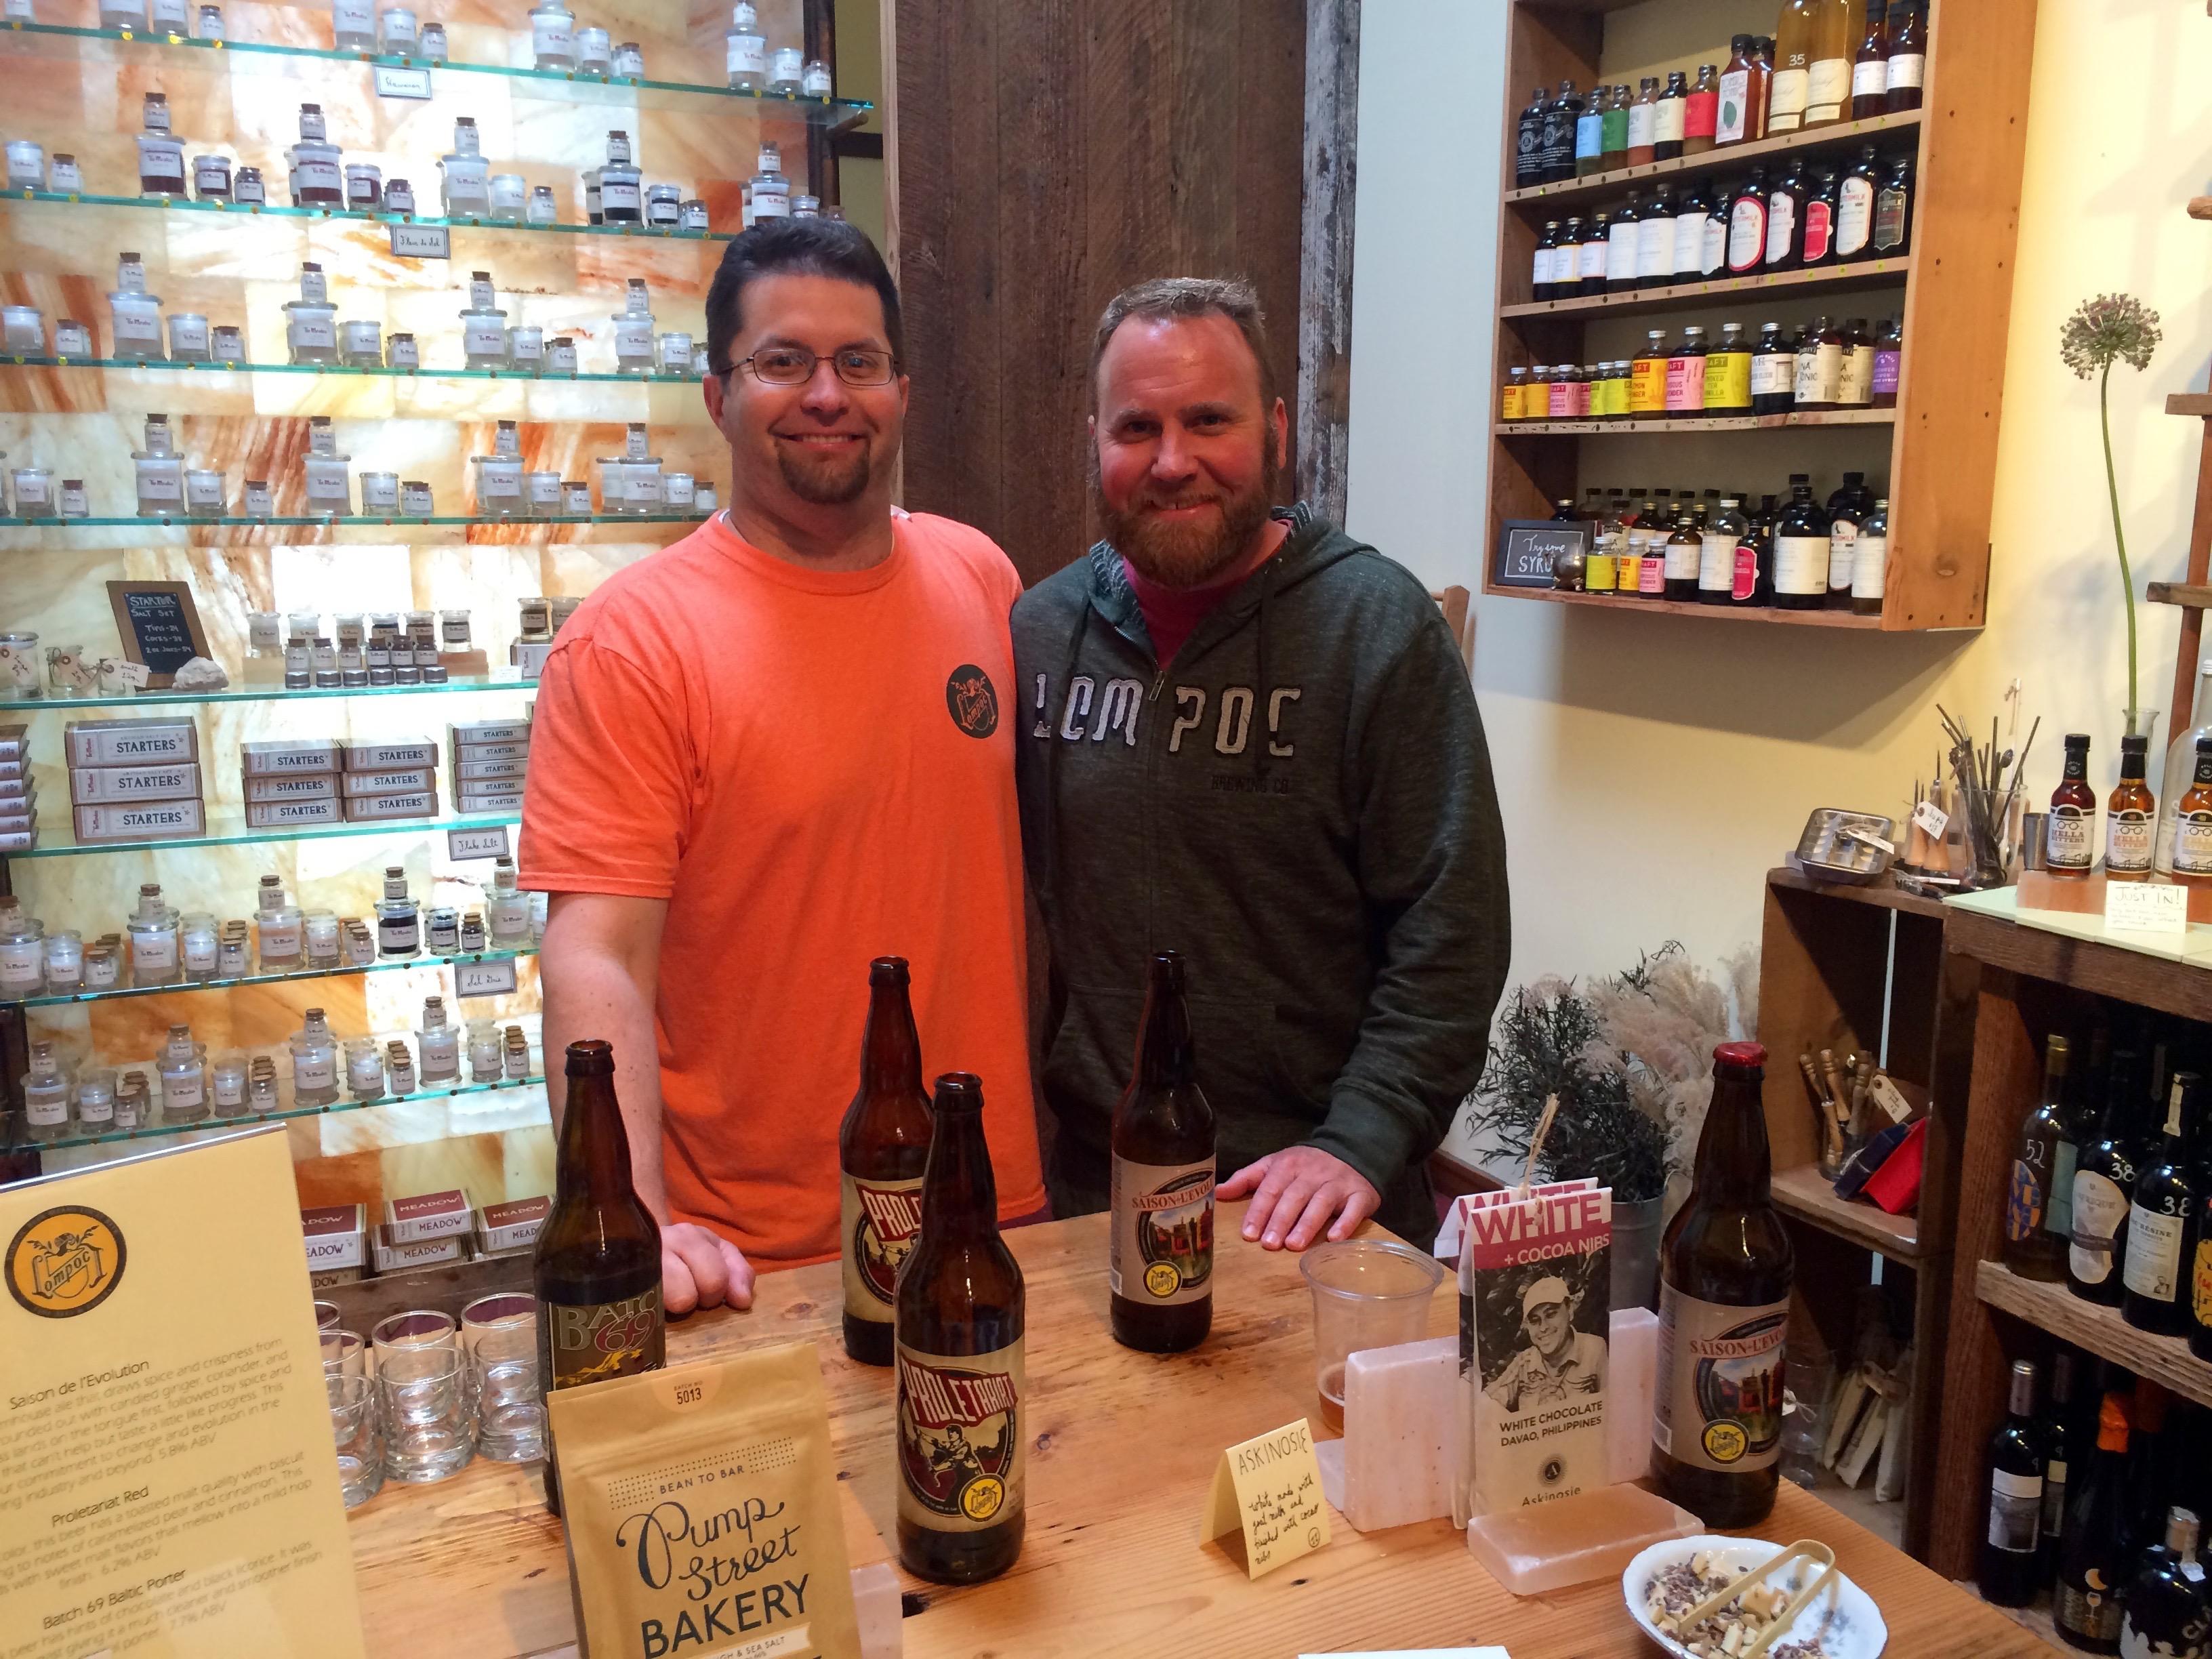 Bryan Keilty and Matt Kohnke of Lompoc Sampling Beer & Chocolate